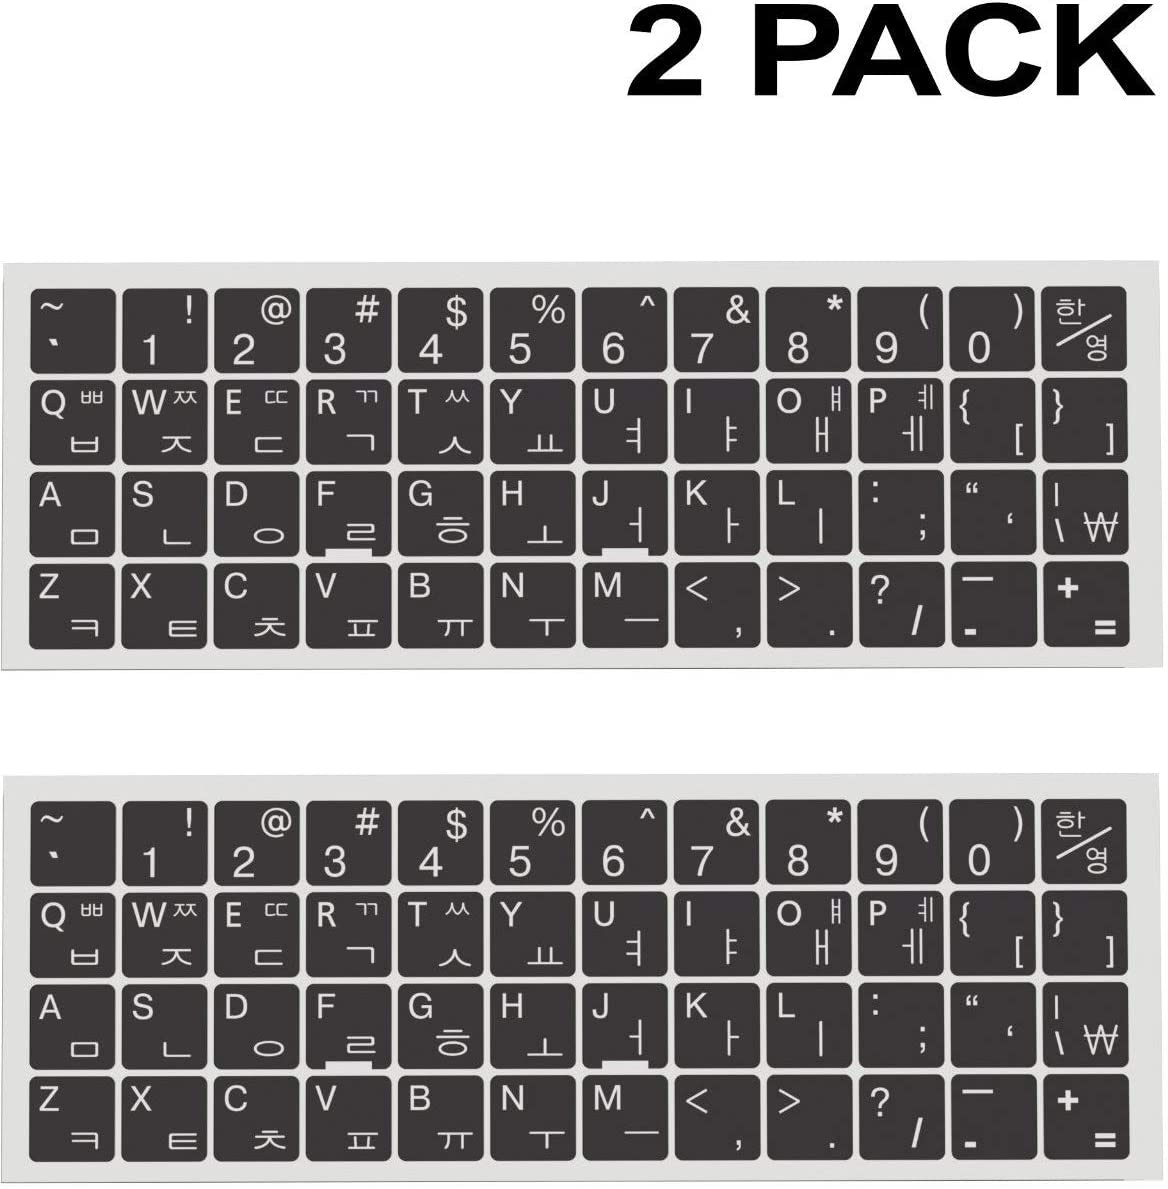 2-Pack Universal Korean Keyboard Stickers, Replacement Korean English Keyboard Stickers with Black Background and White Lettering for Notebook Desktop Computer Laptops (Korean)